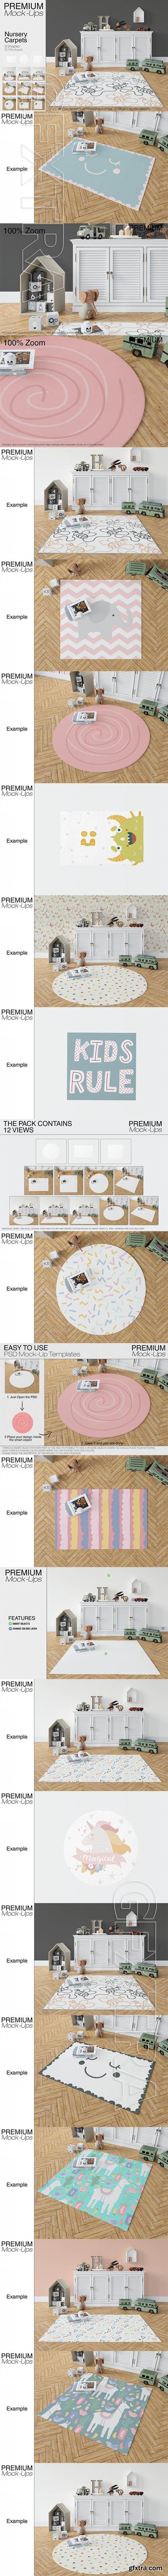 GR - 3 Types of Carpets - Round, Square & Rectangular 22040192